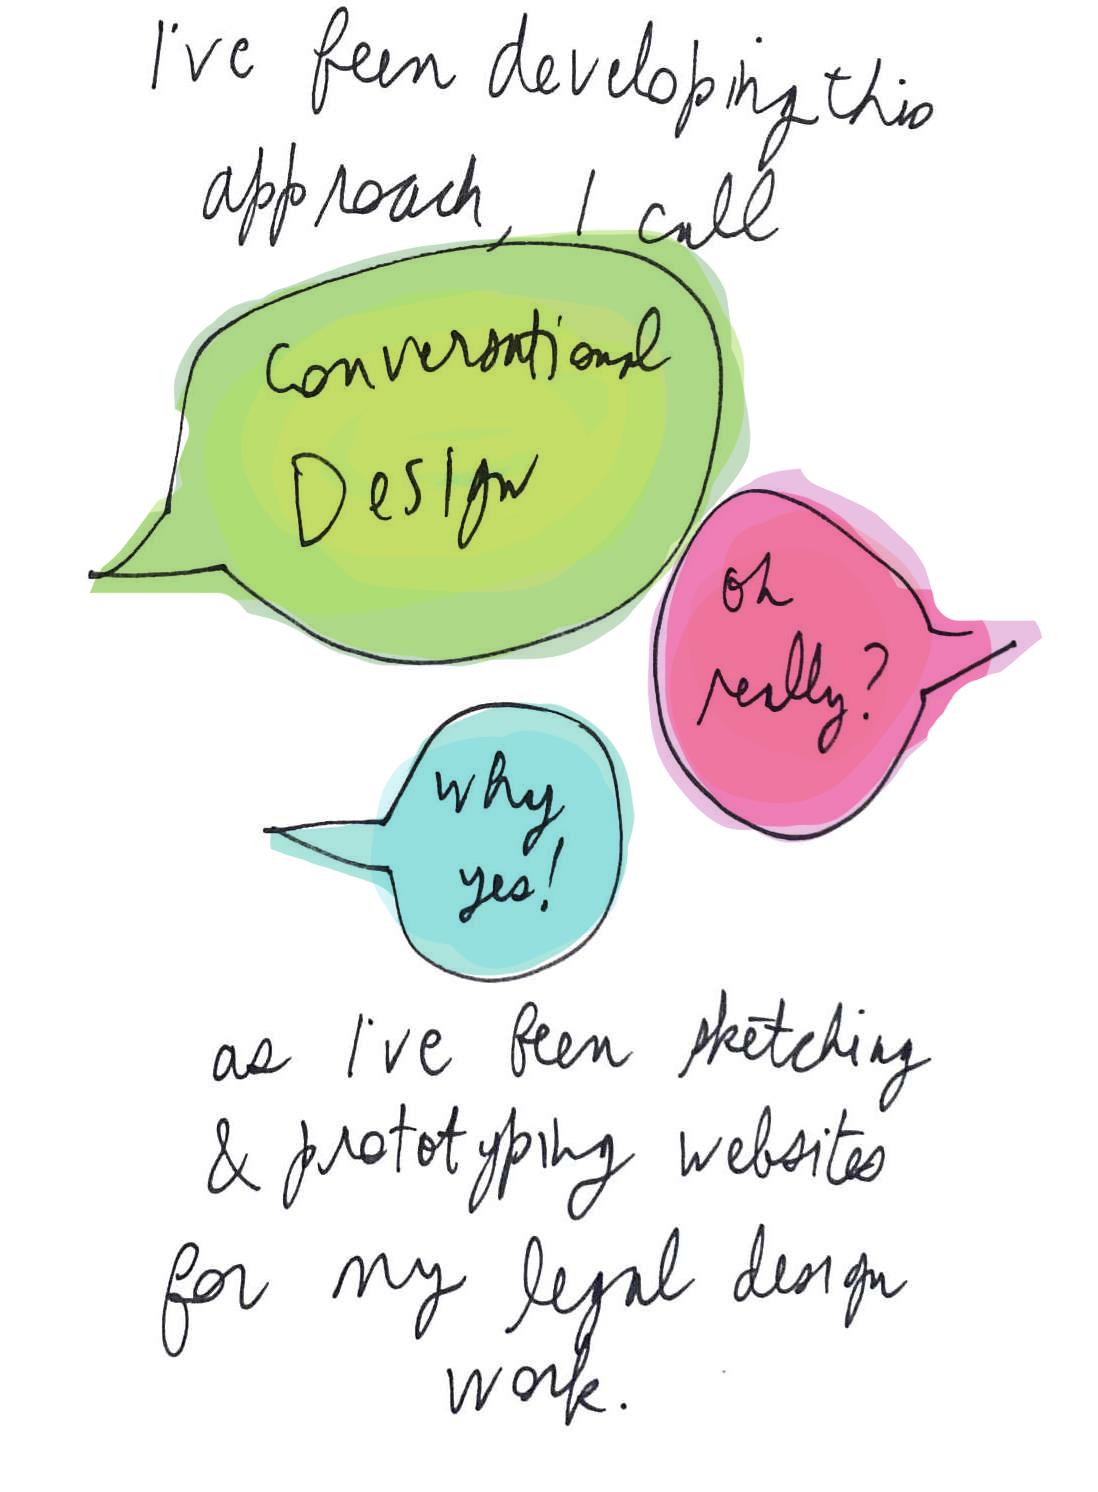 Conversational Design method